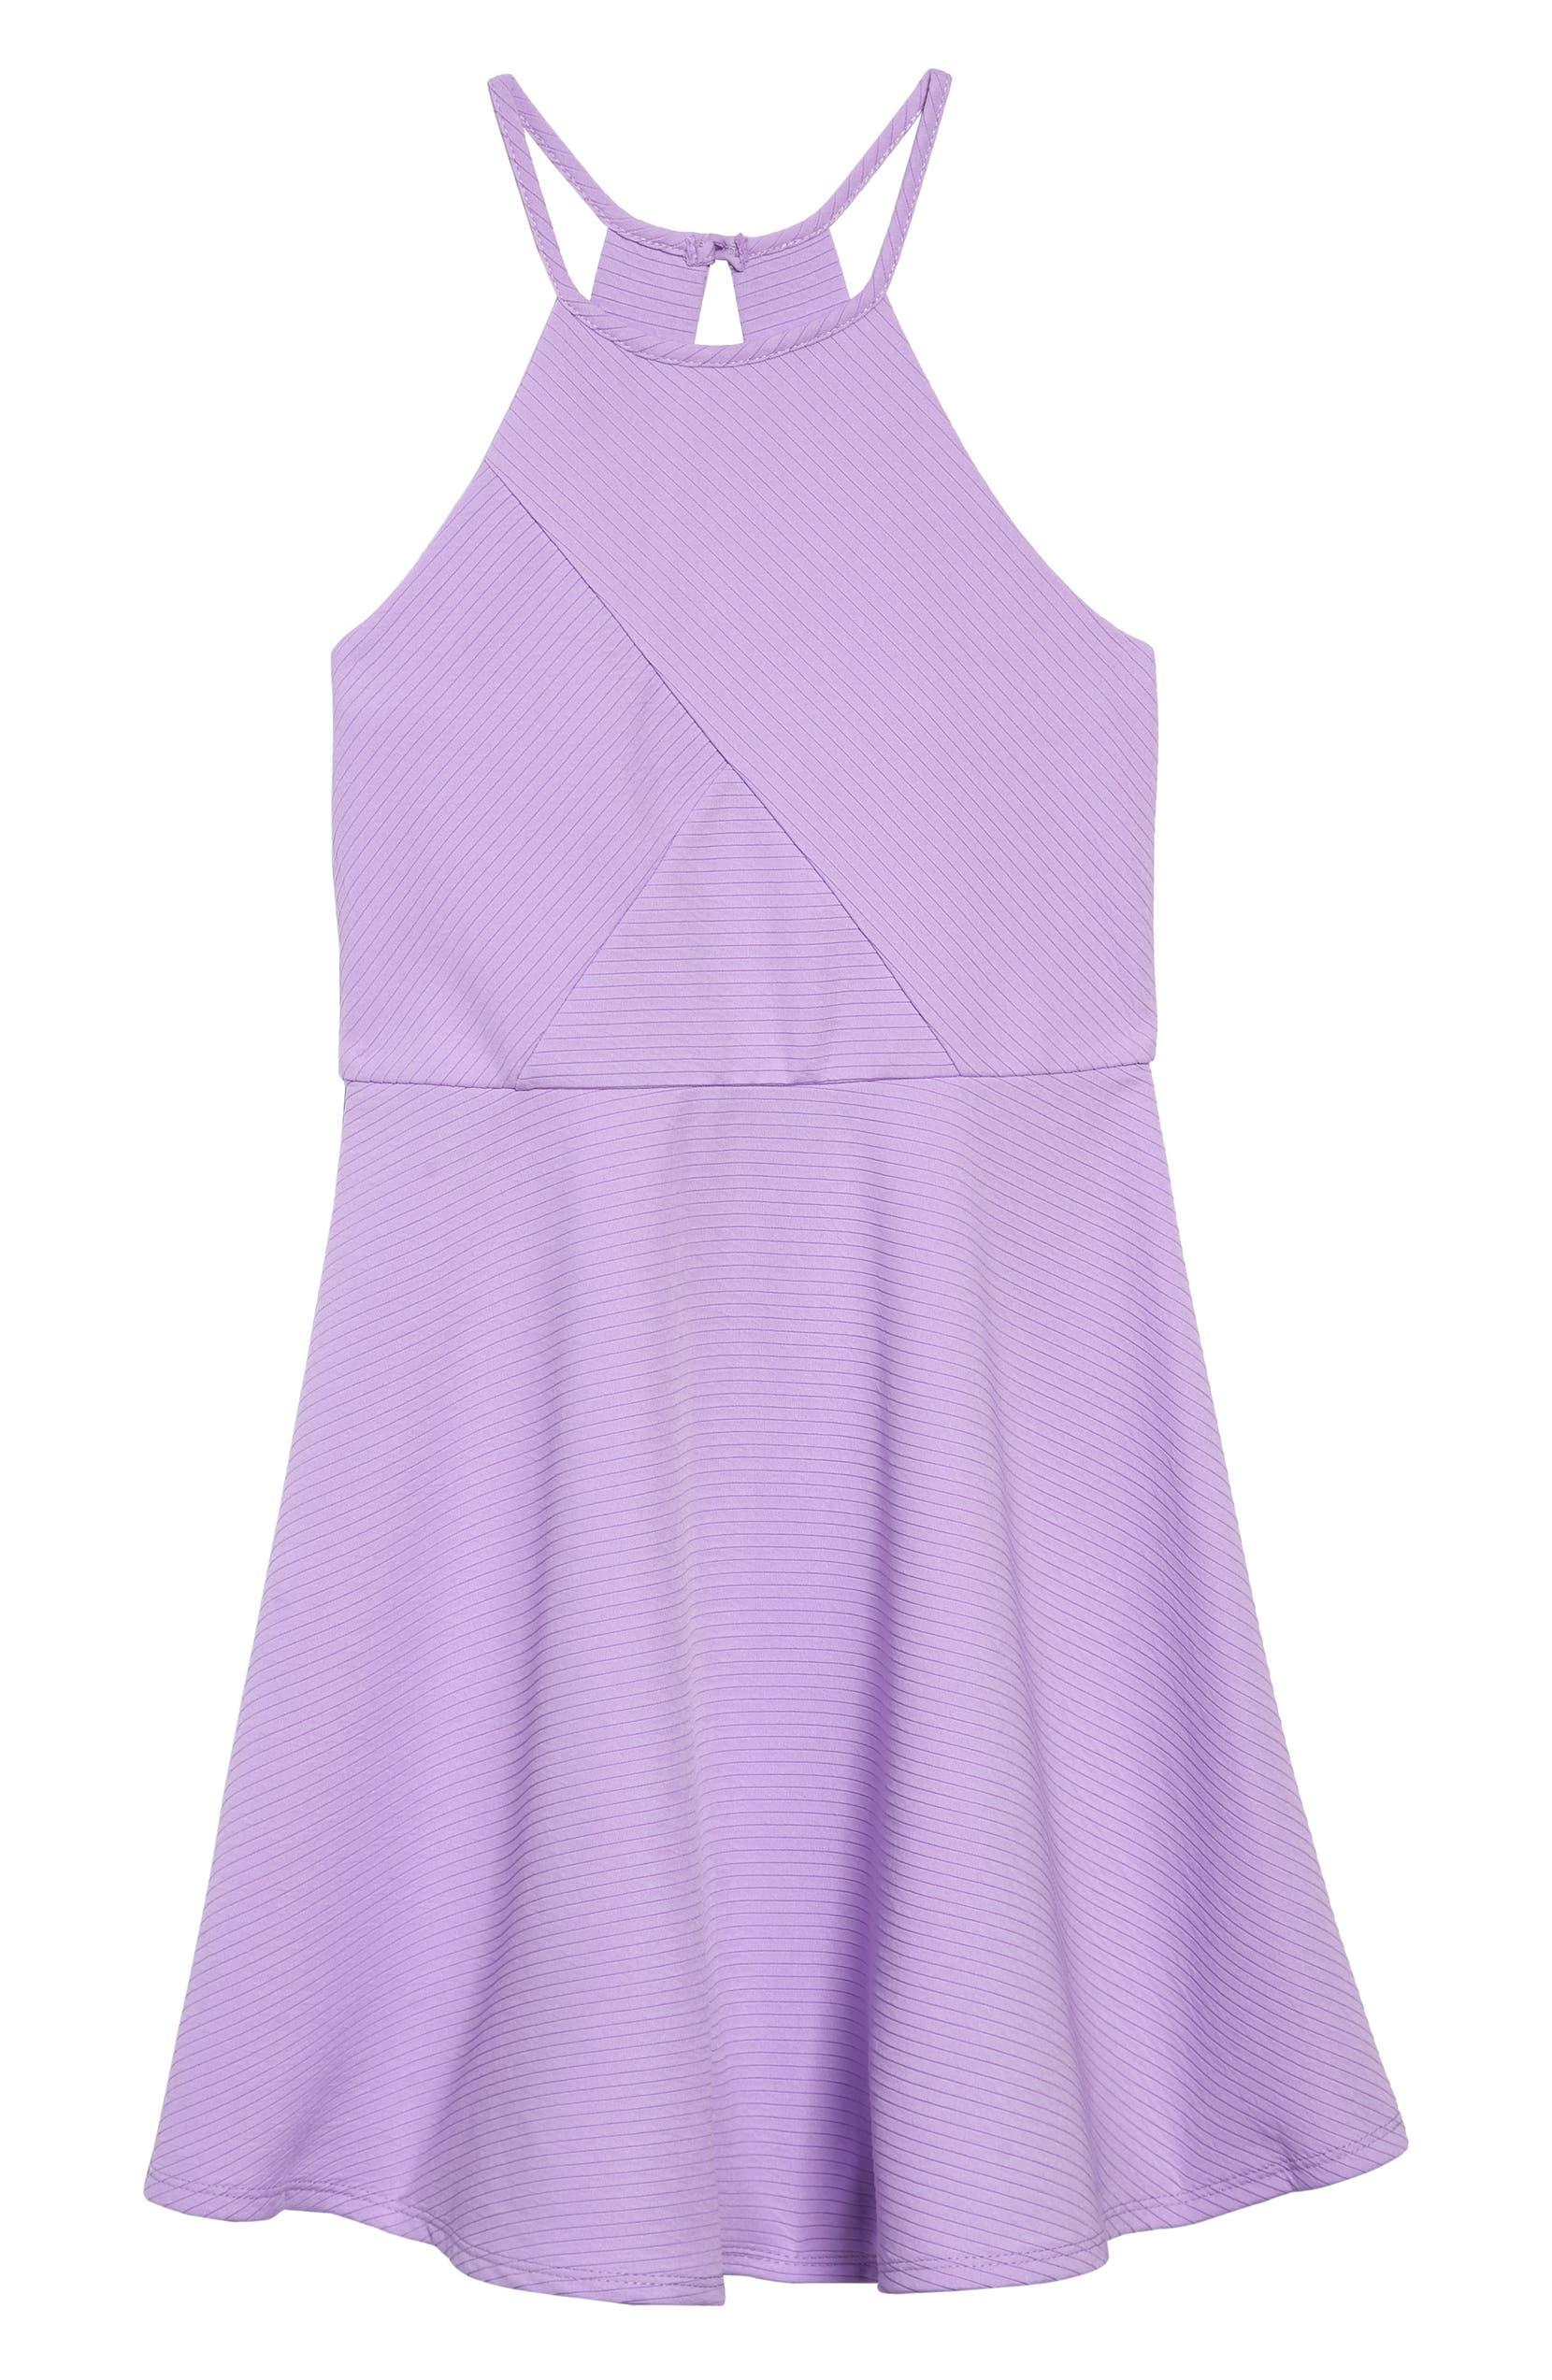 5f01942b16b2 Zunie Textured Skater Dress (Little Girls & Big Girls) | Nordstrom